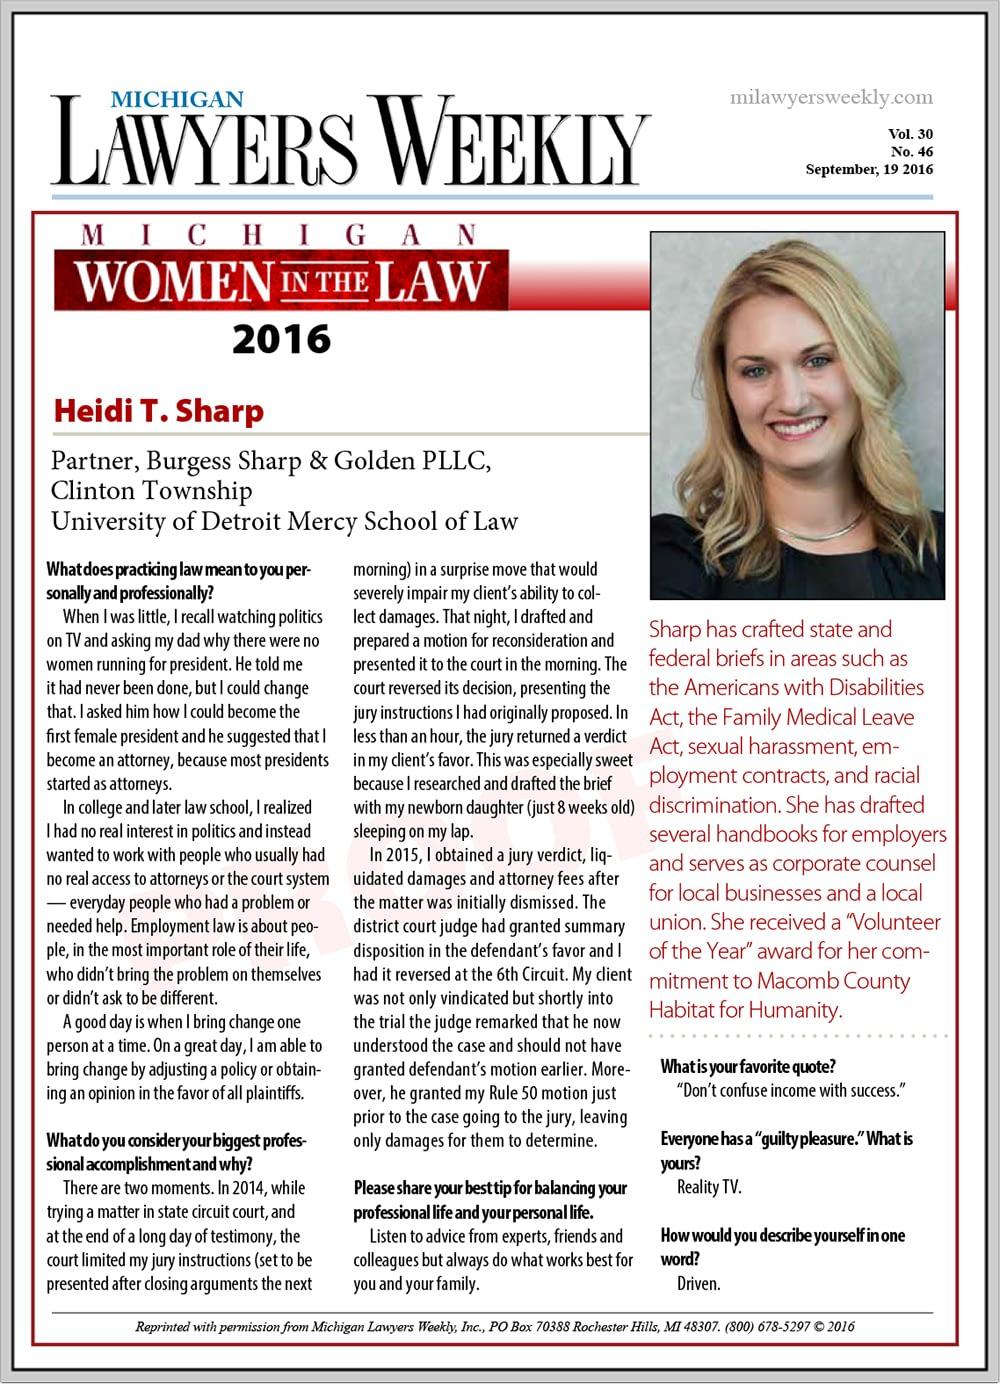 Michigan Women in the Law - Heidi Sharp